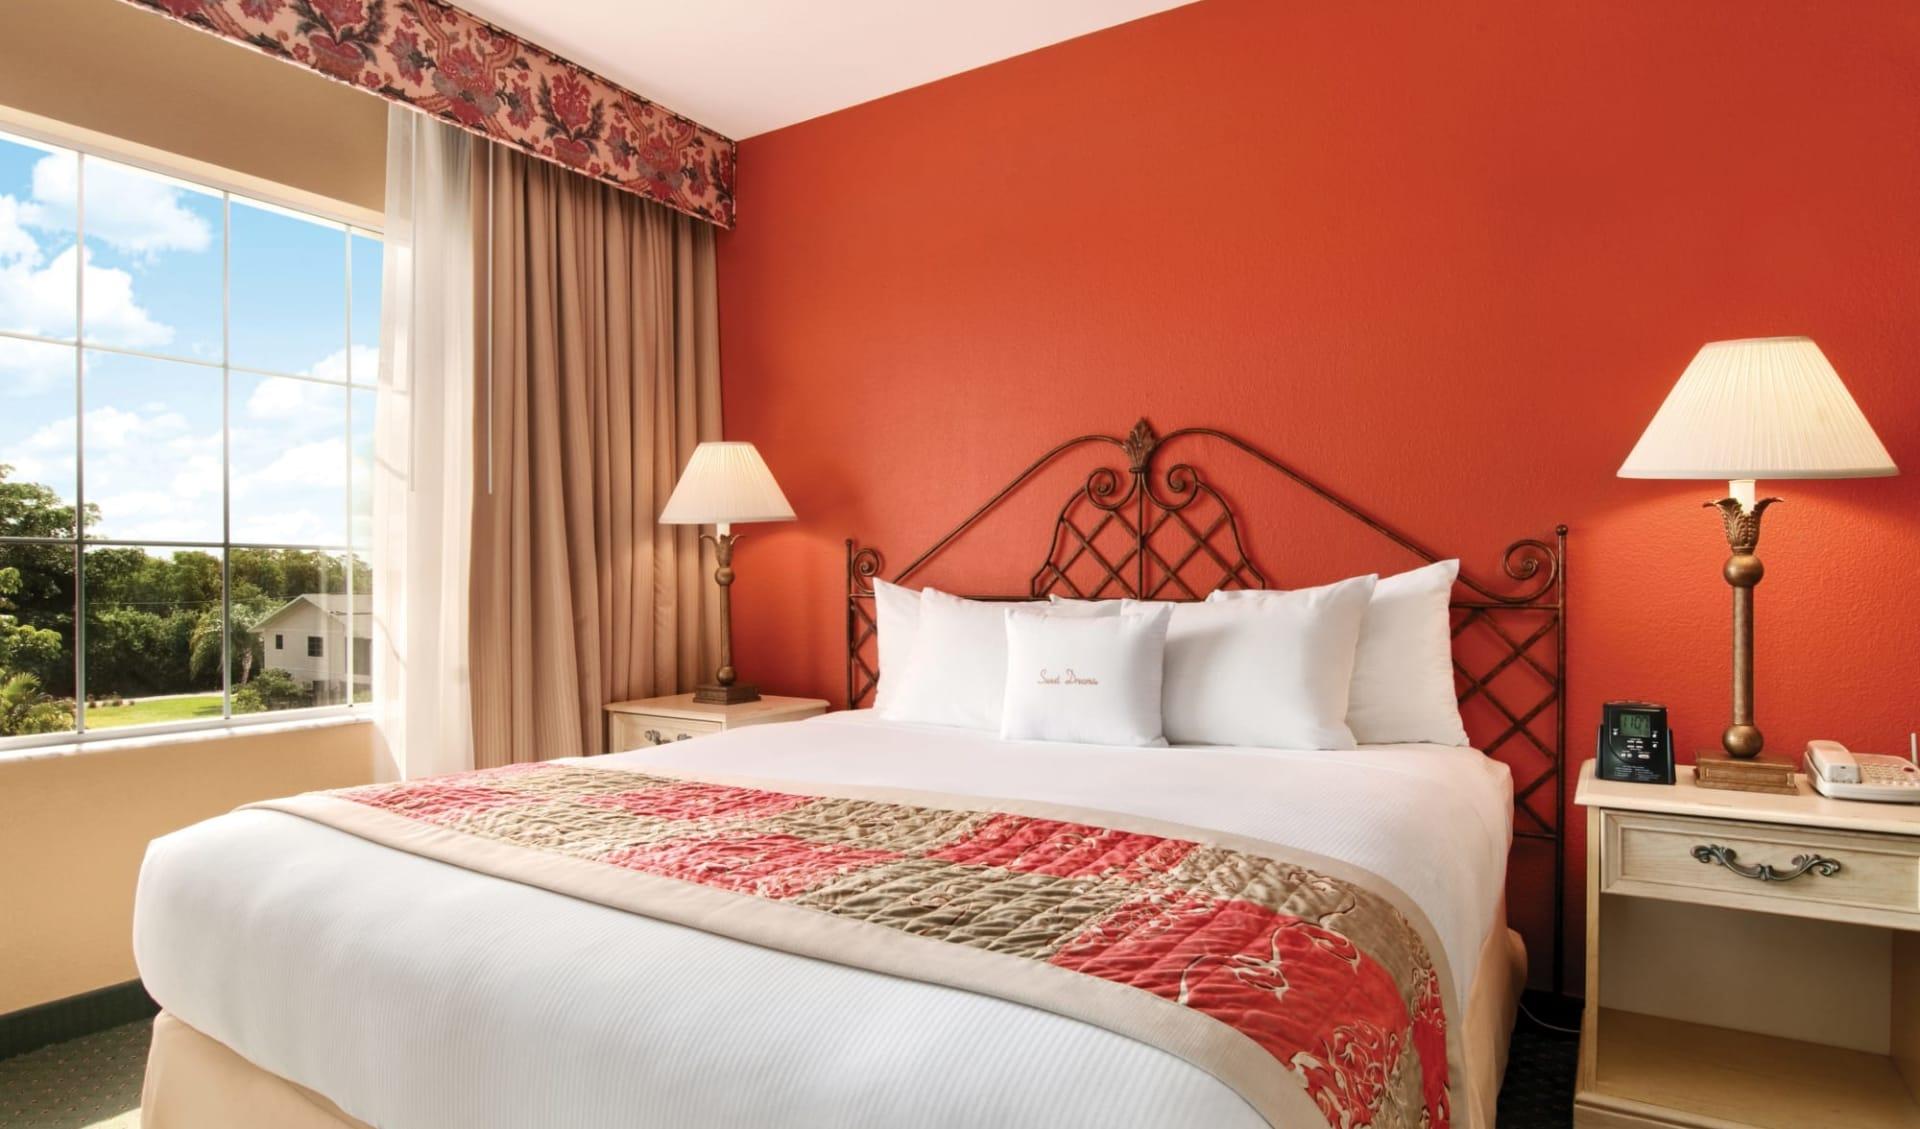 Doubletree Guest Suites in Naples:  Zimmer_Doubletree Guest Suites Nales_Standard_ATI